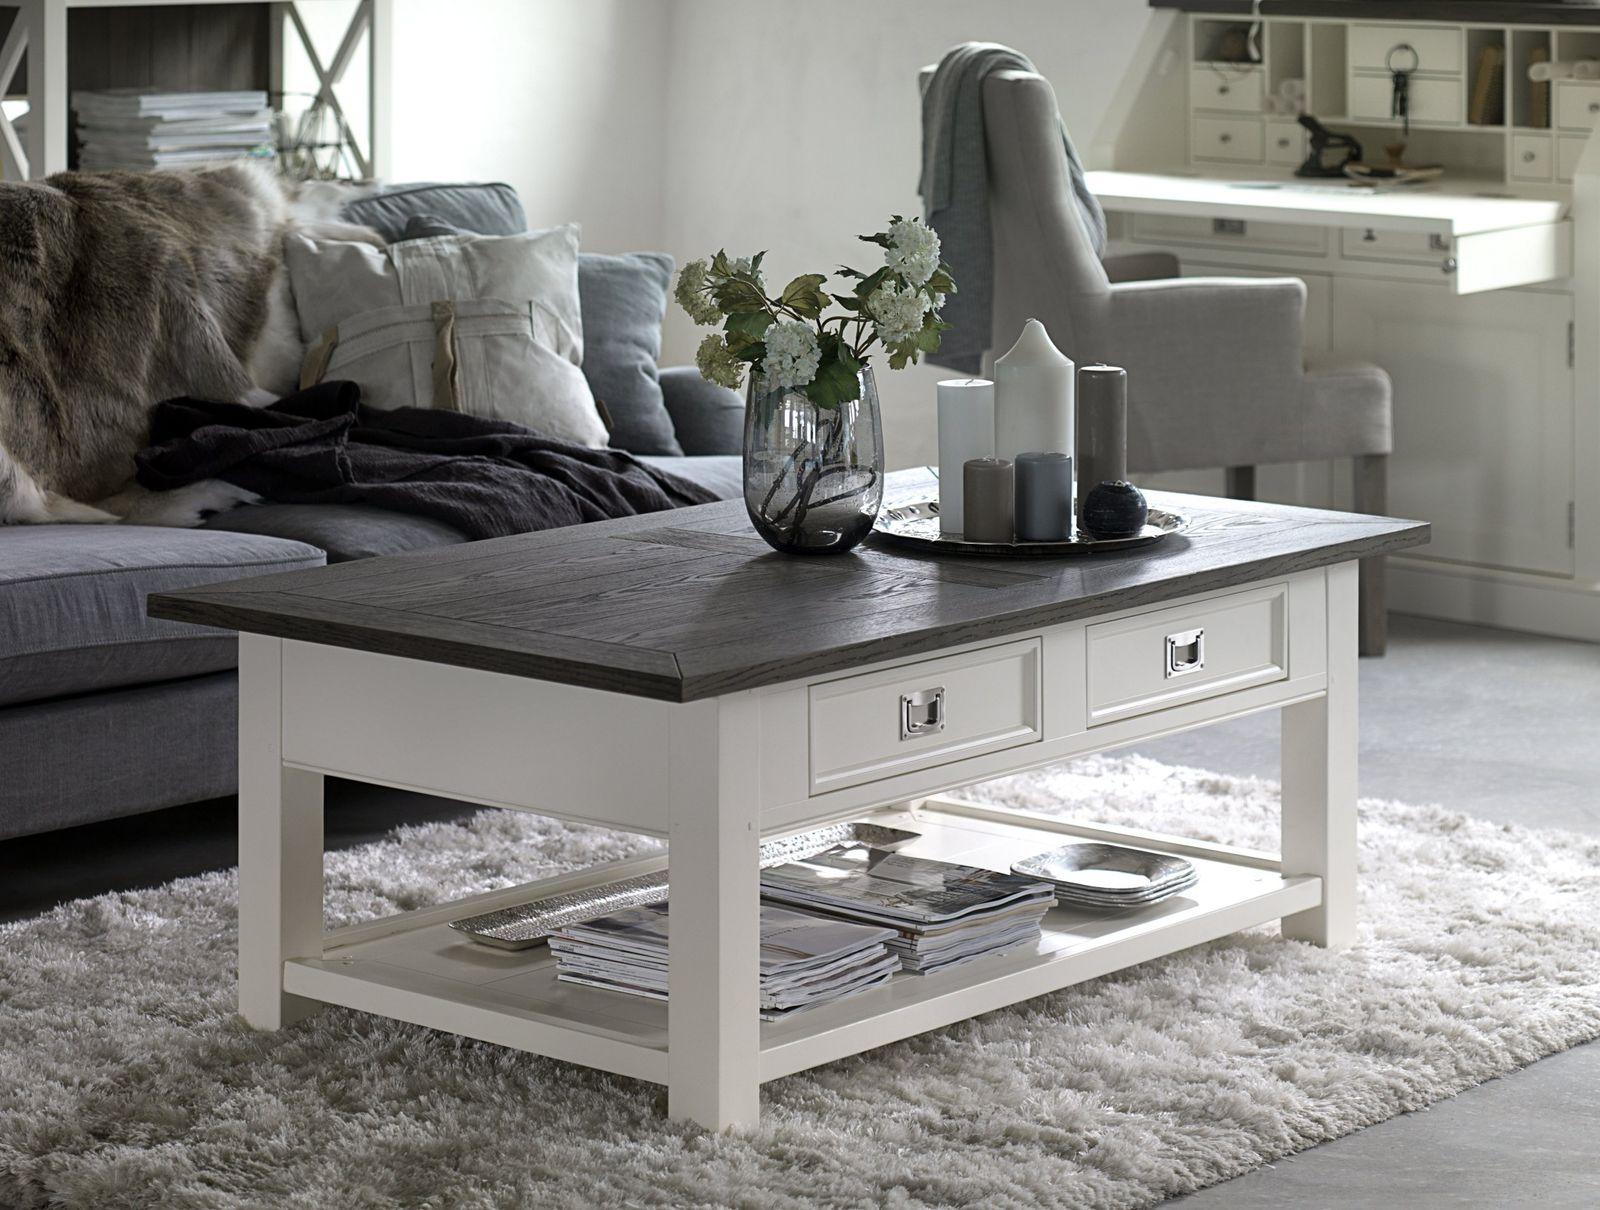 couchtisch skagen sk wei smoked massivholz l140 x b80 x. Black Bedroom Furniture Sets. Home Design Ideas